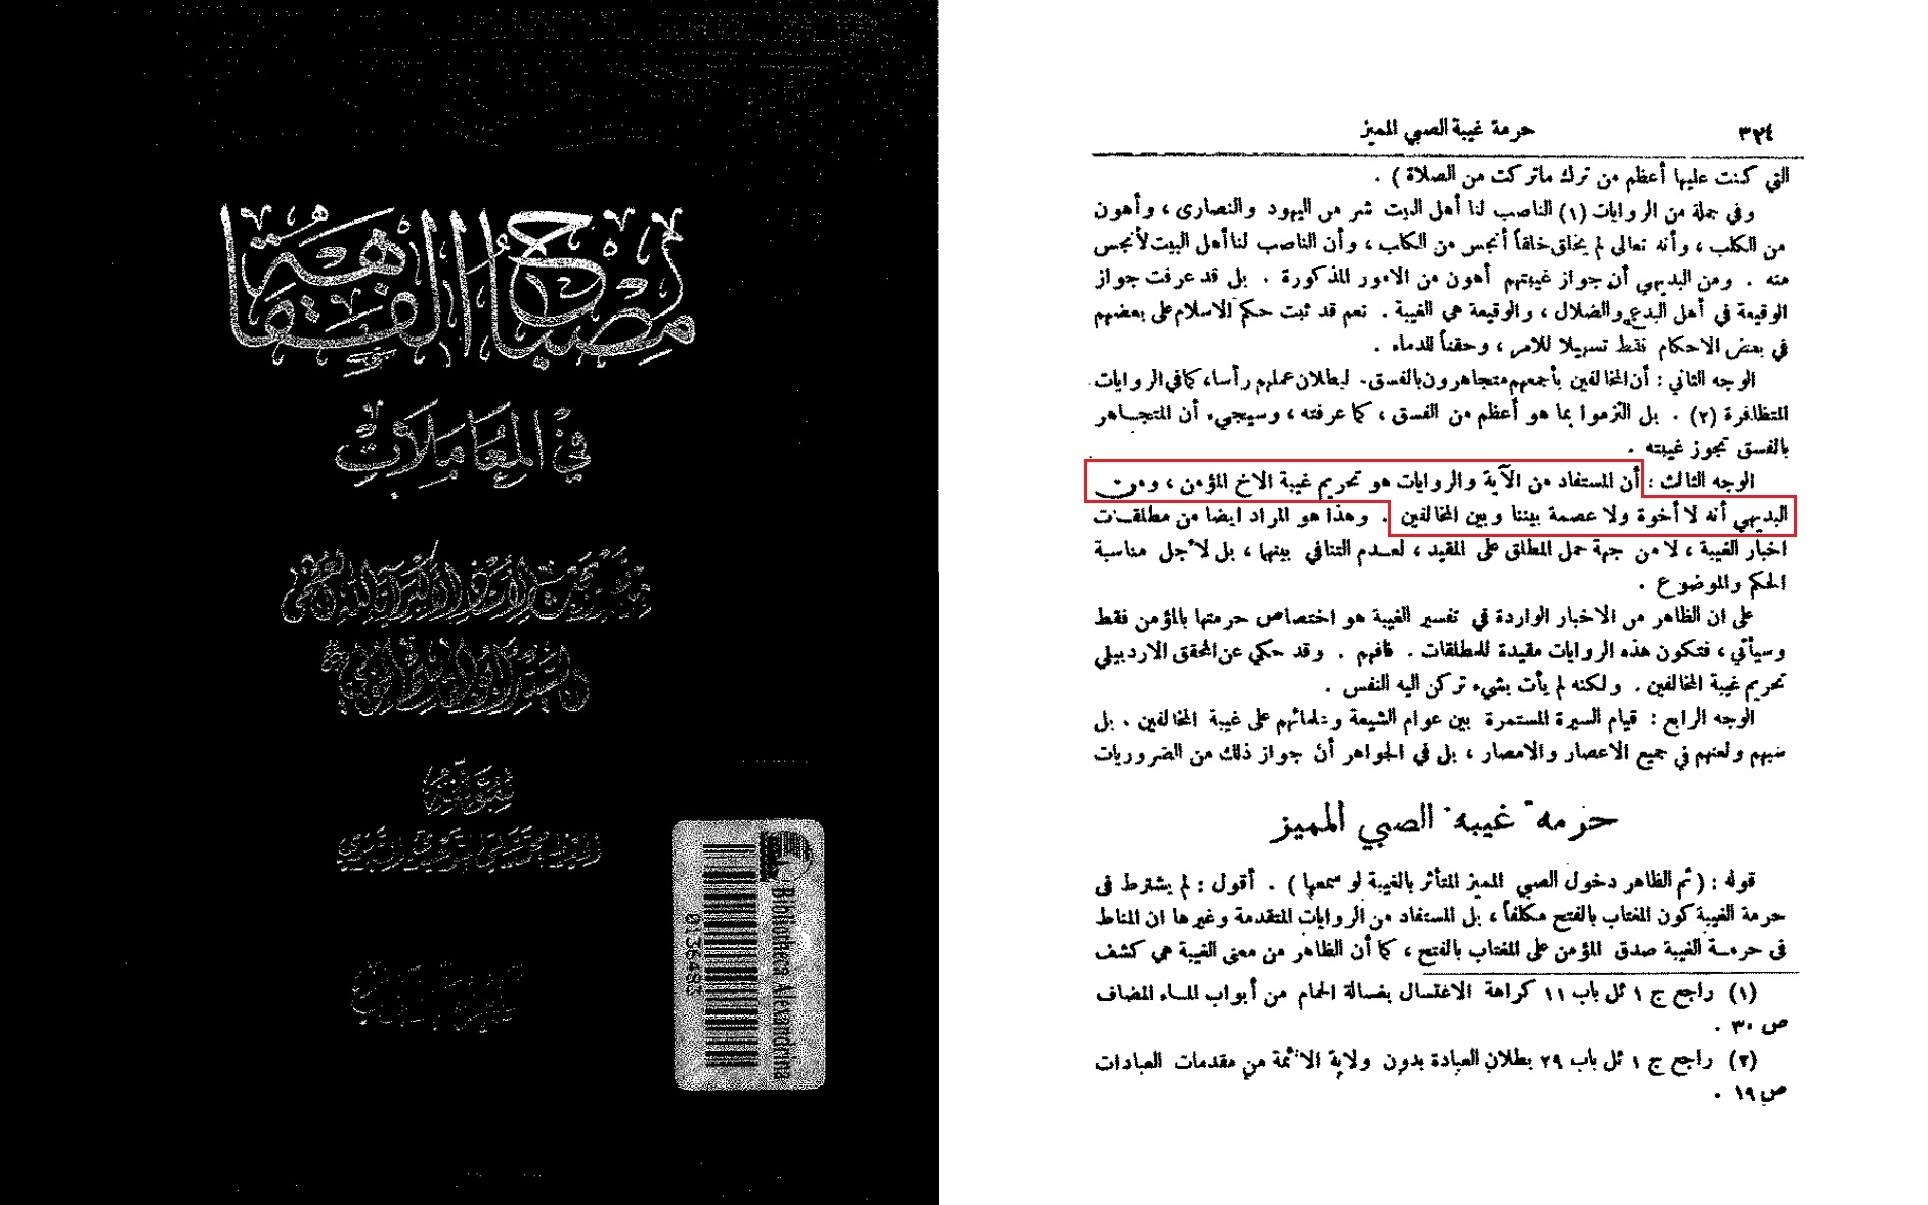 Mesba7-e Faqaha B 1 S 324